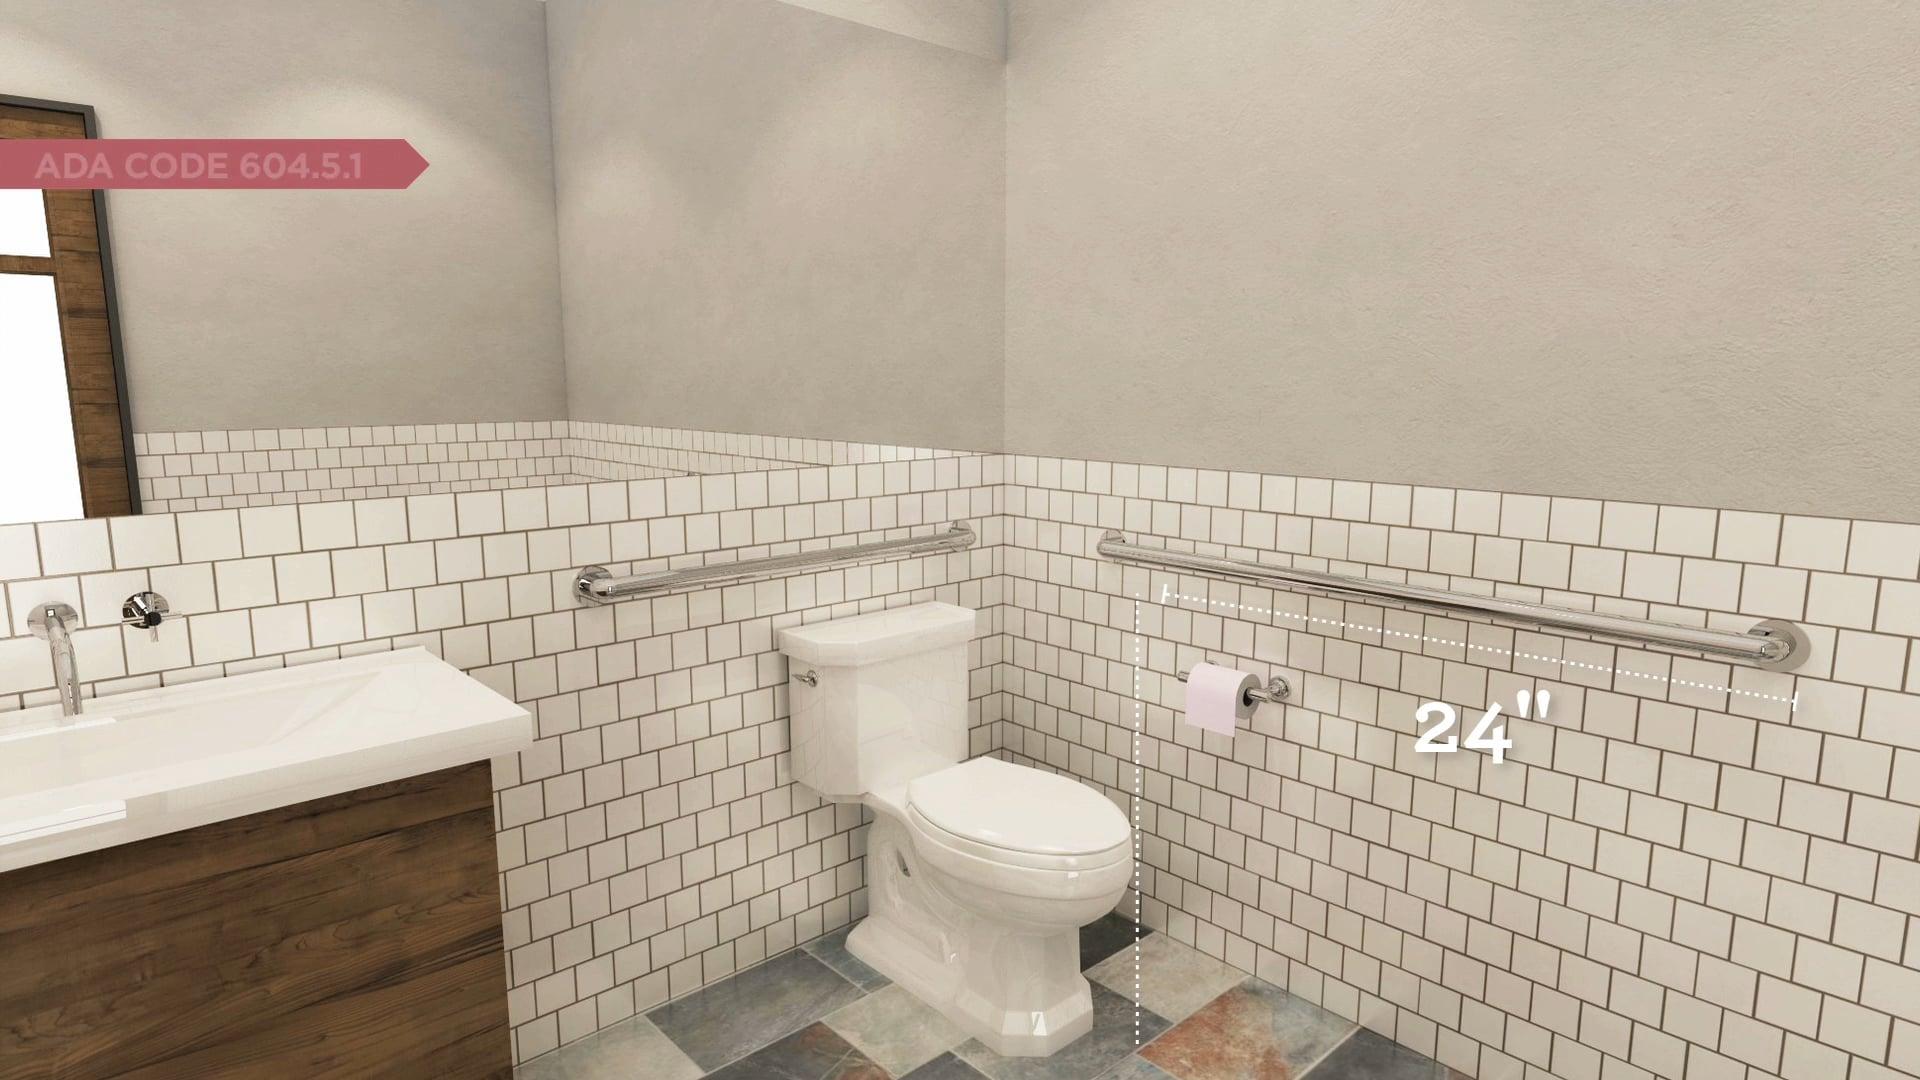 How to Design an ADA Compliant Bathroom: Grab Bars